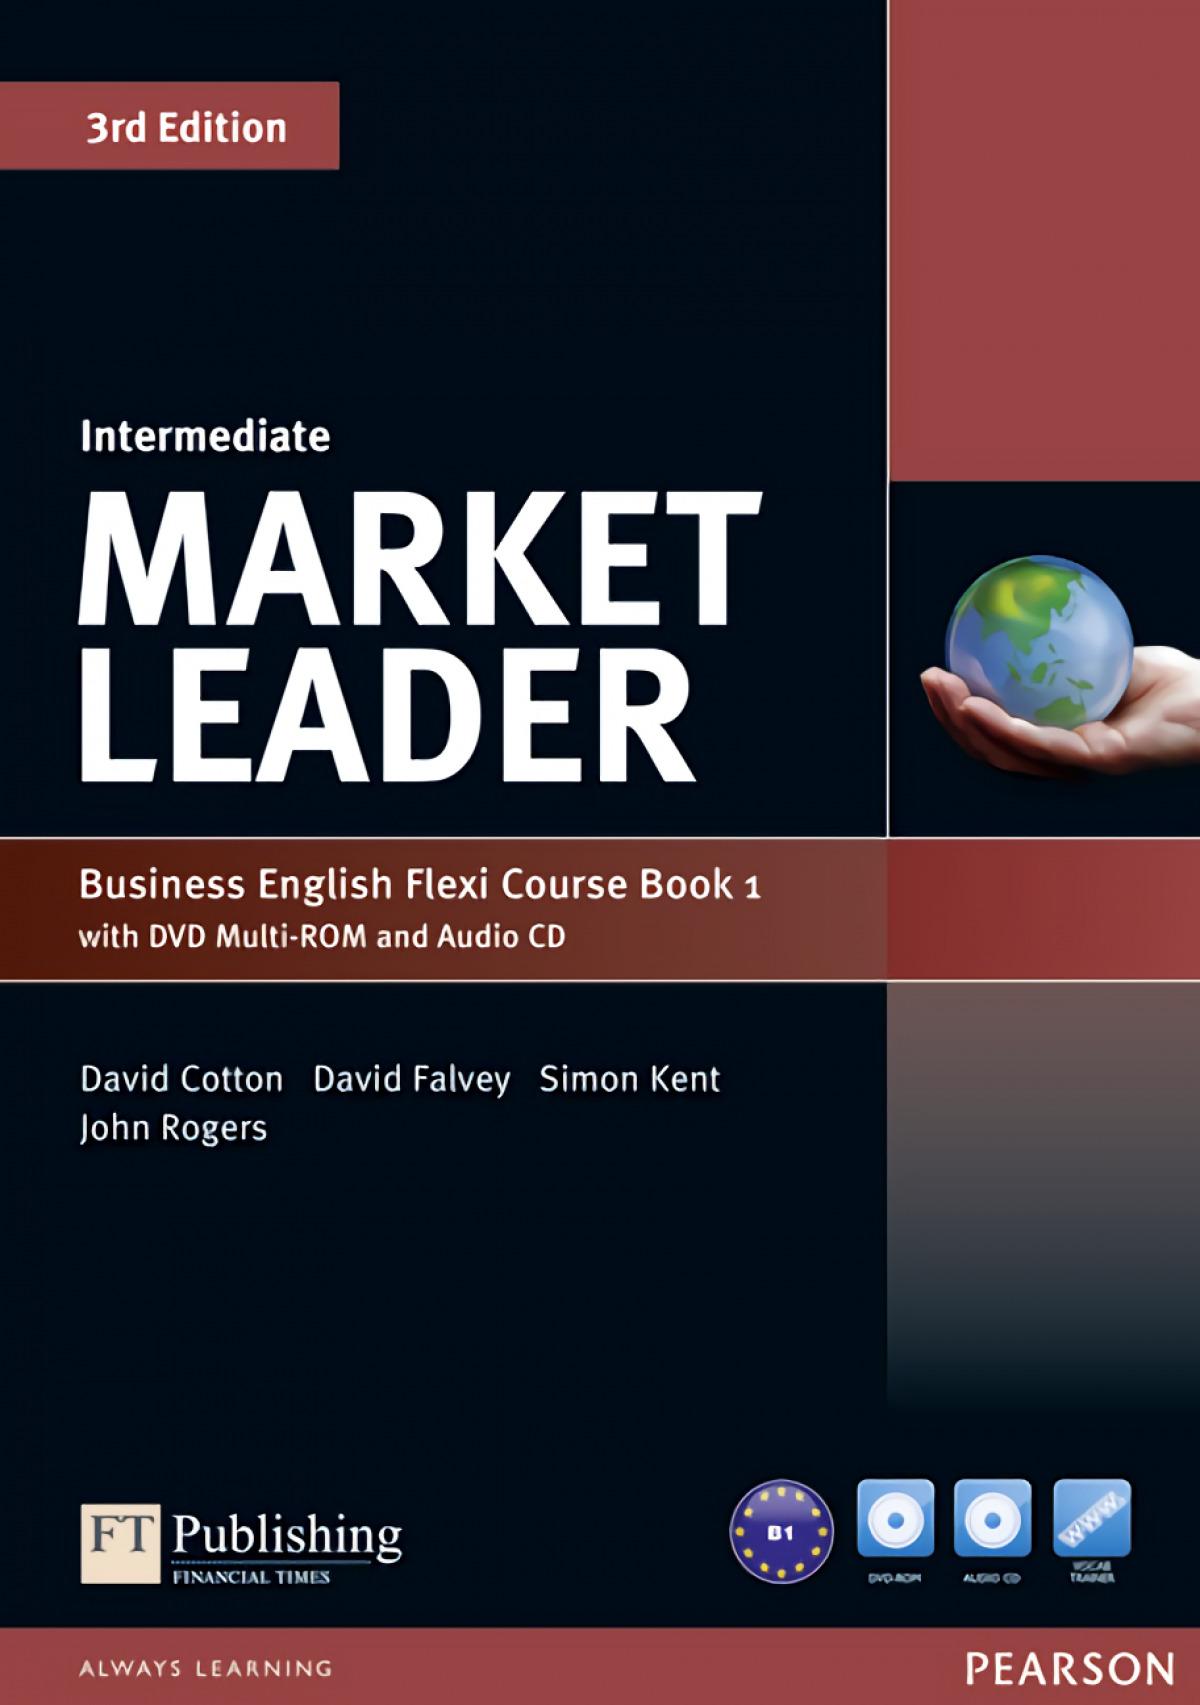 market leader intermediate flexi 1 coursebook pack